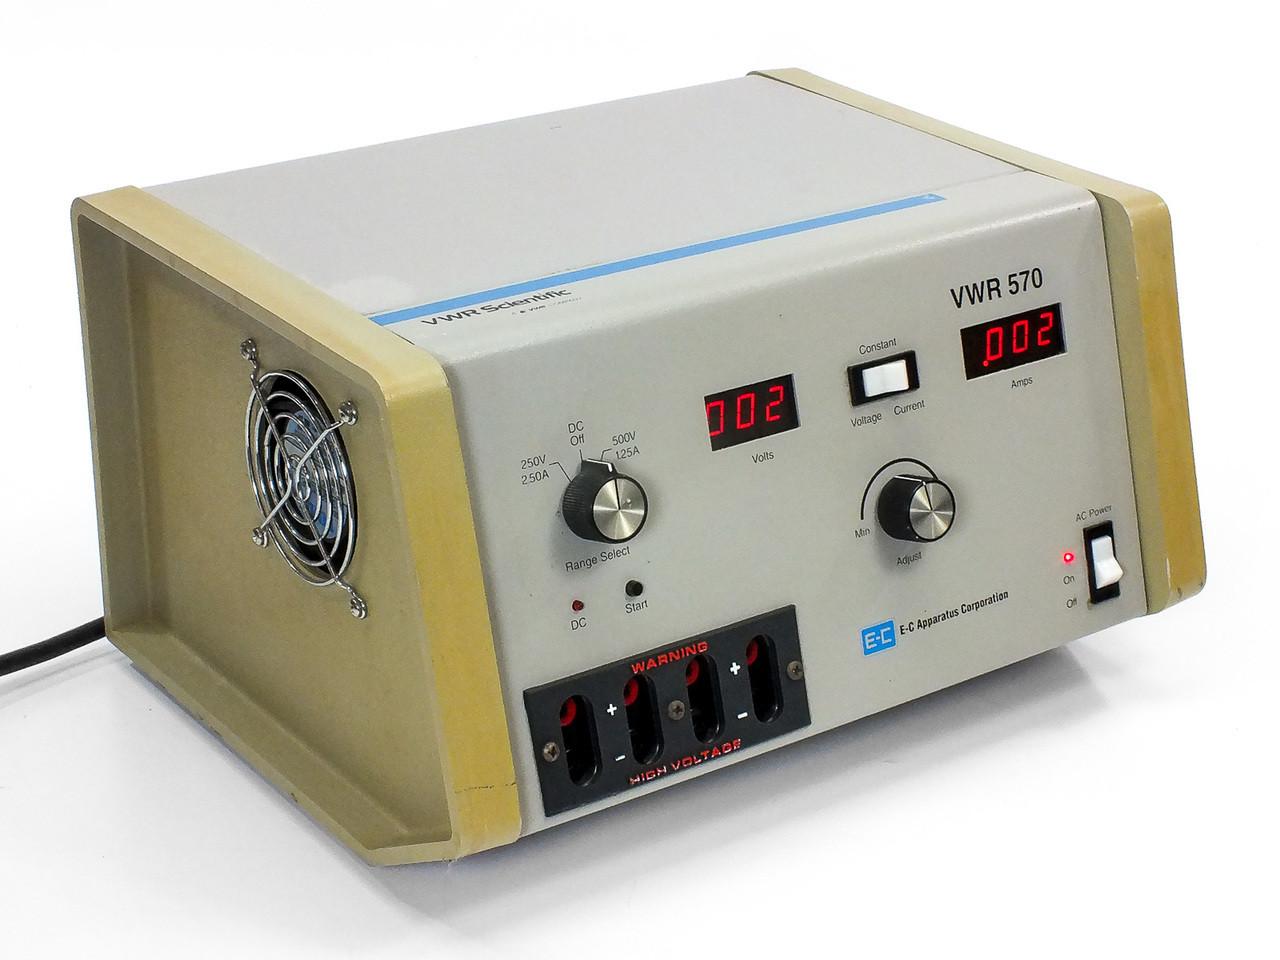 VWR Scientific 570 DC Power Supply | RecycledGoods.com